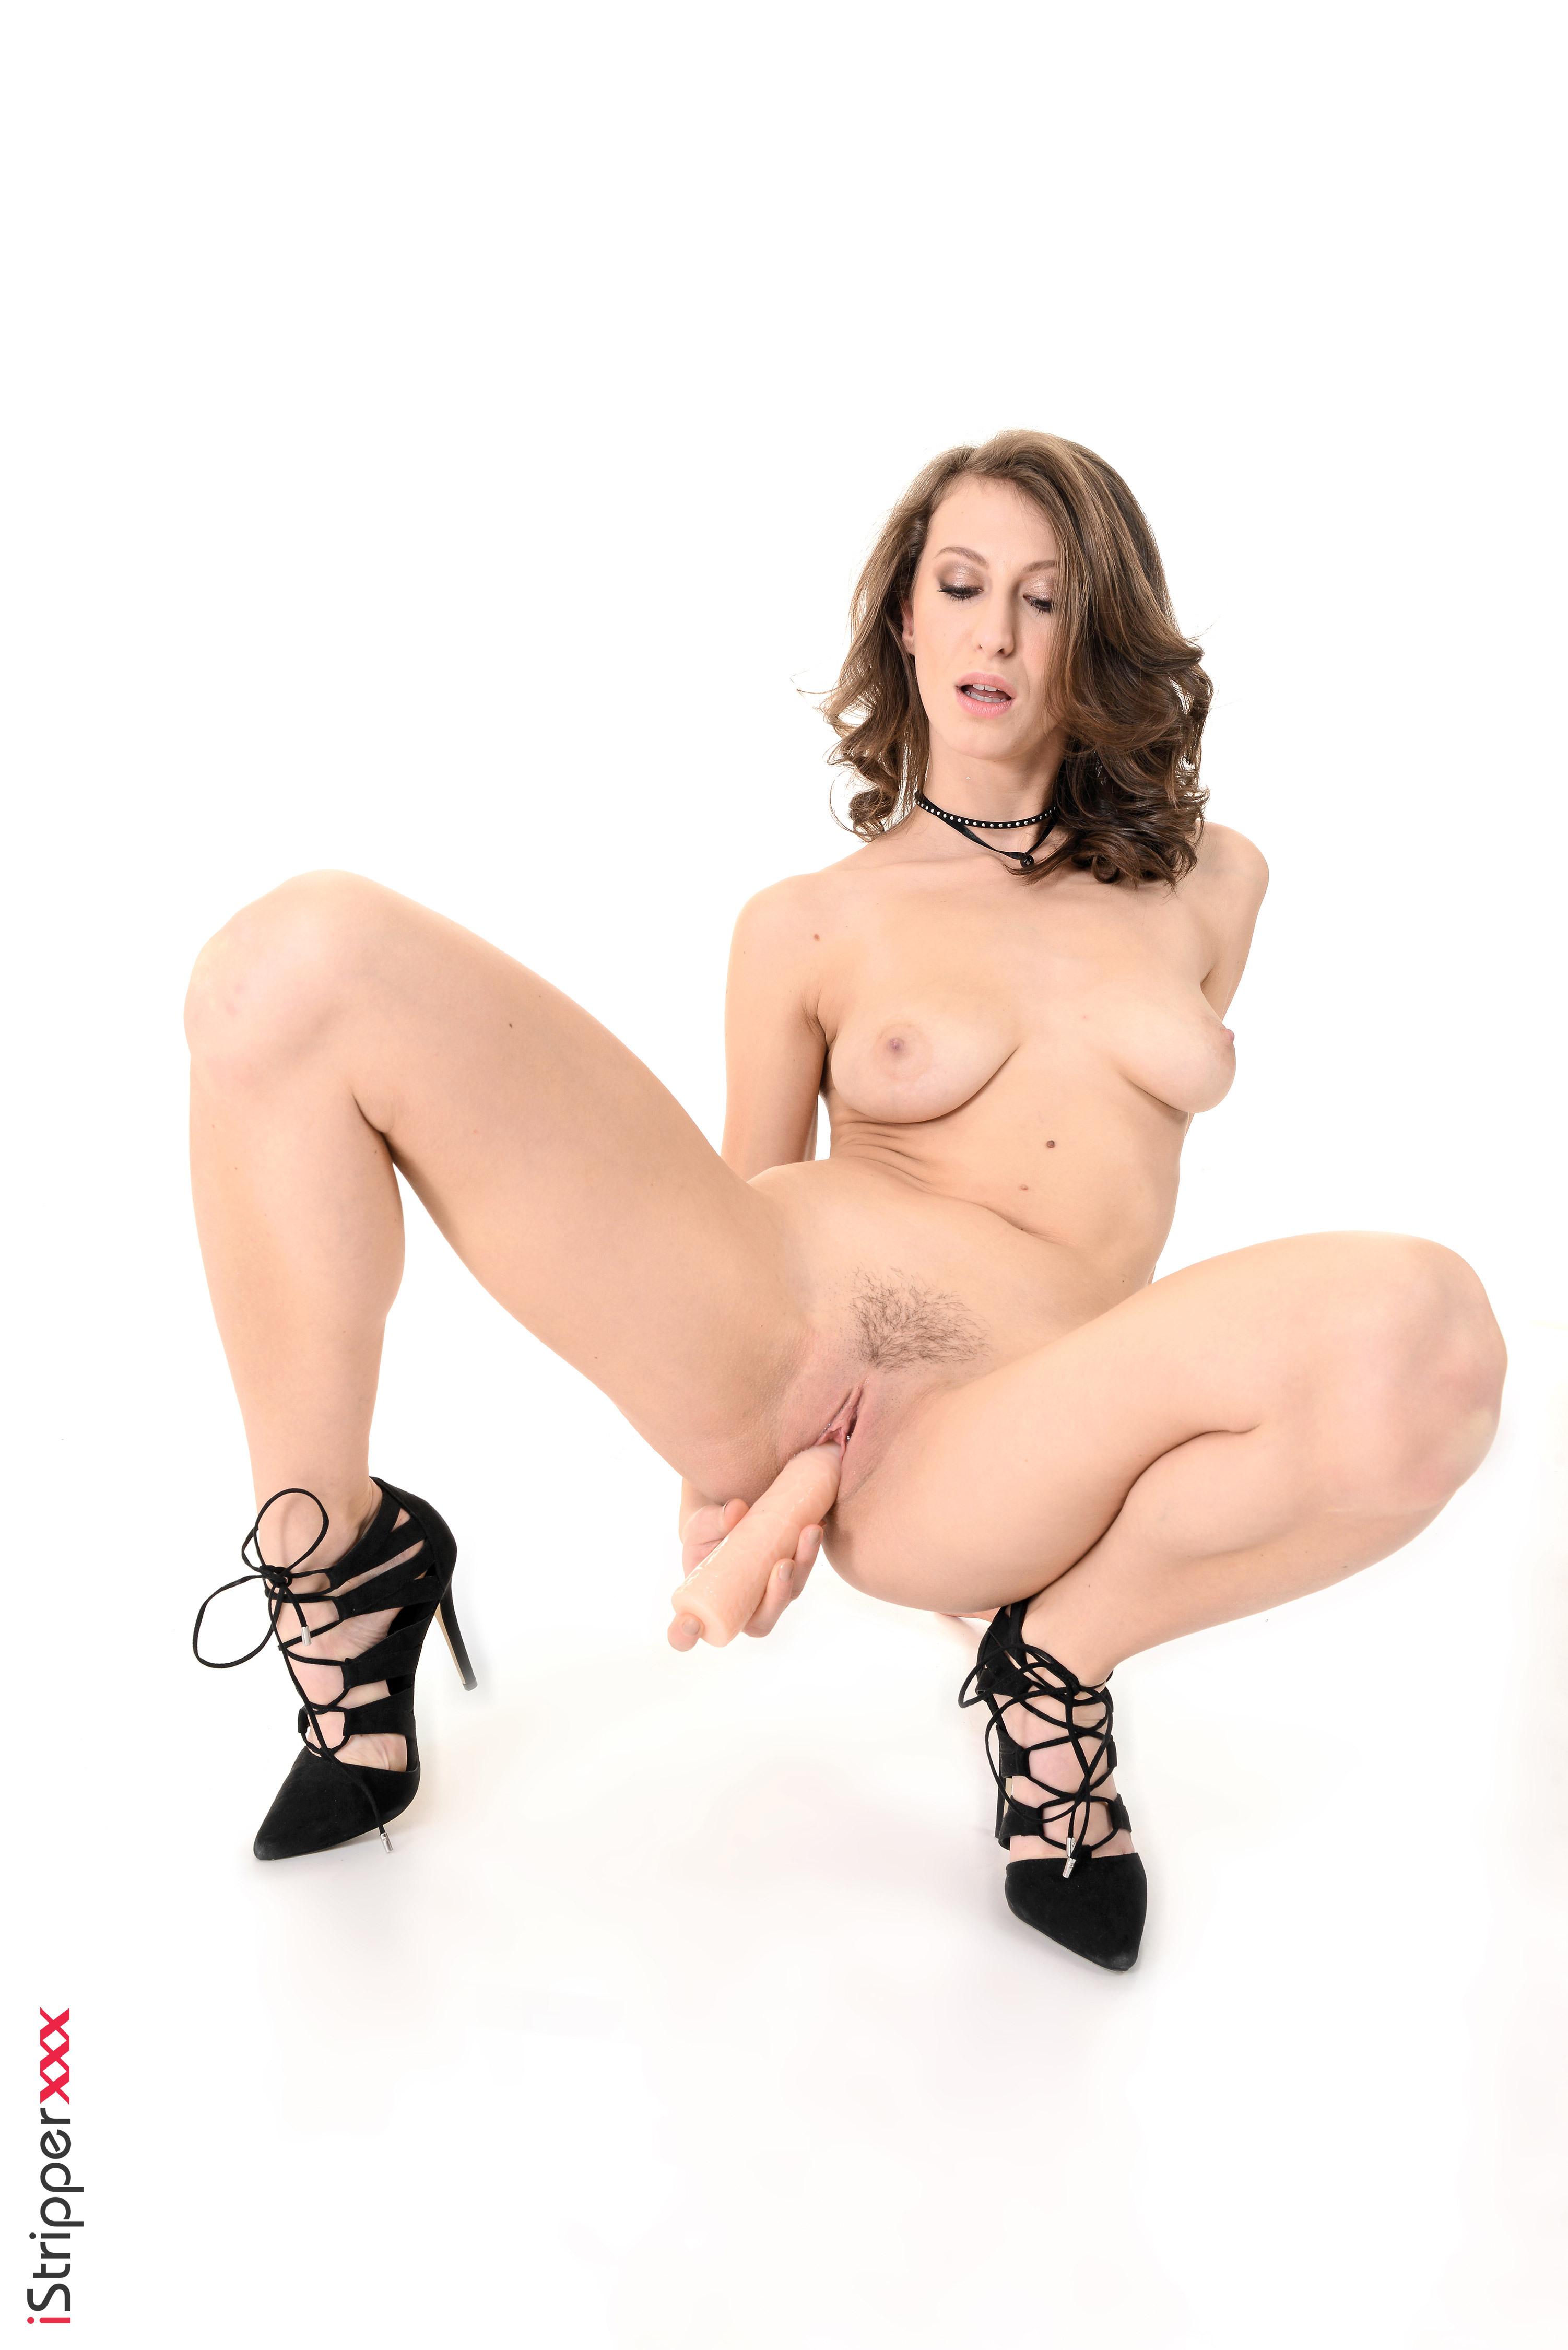 hd close up pussy pics